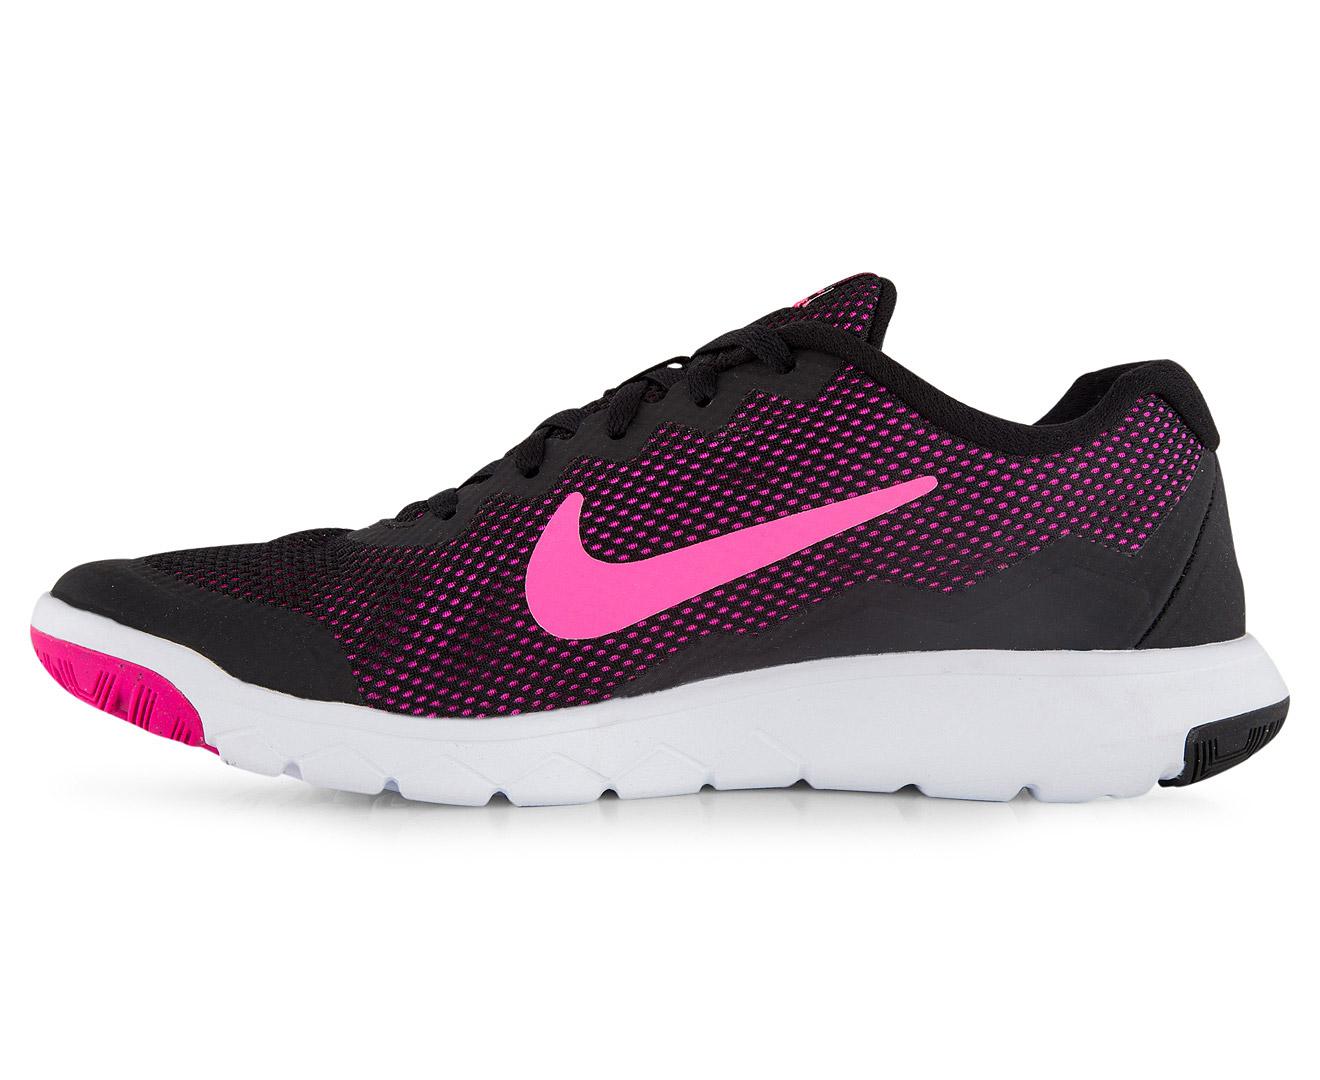 nike women 39 s flex experience rn 4 shoe black pink foil. Black Bedroom Furniture Sets. Home Design Ideas